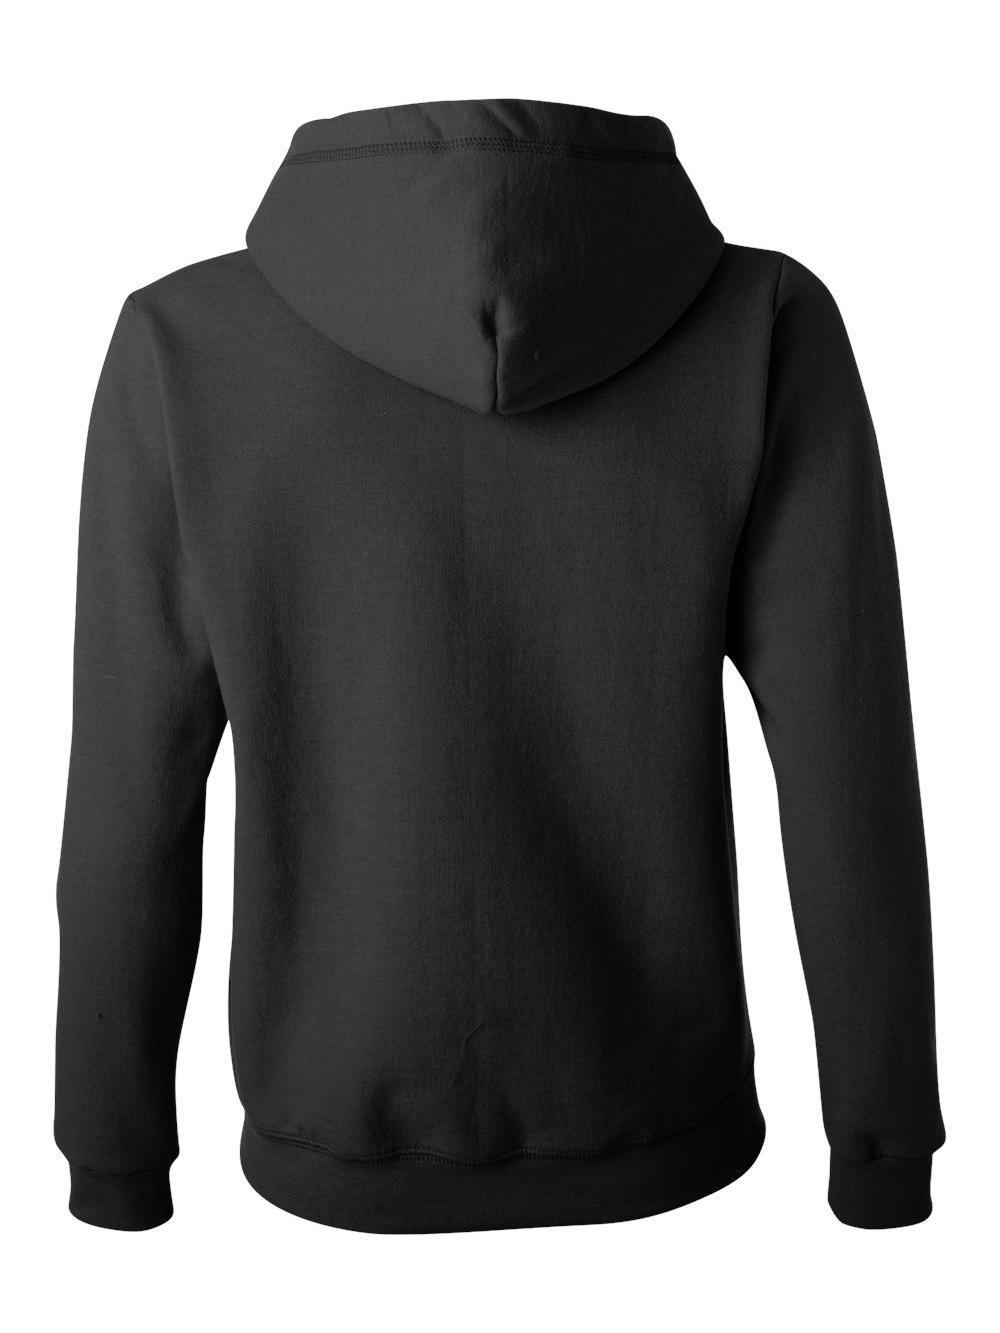 Gildan-Heavy-Blend-Women-039-s-Full-Zip-Hooded-Sweatshirt-18600FL thumbnail 7